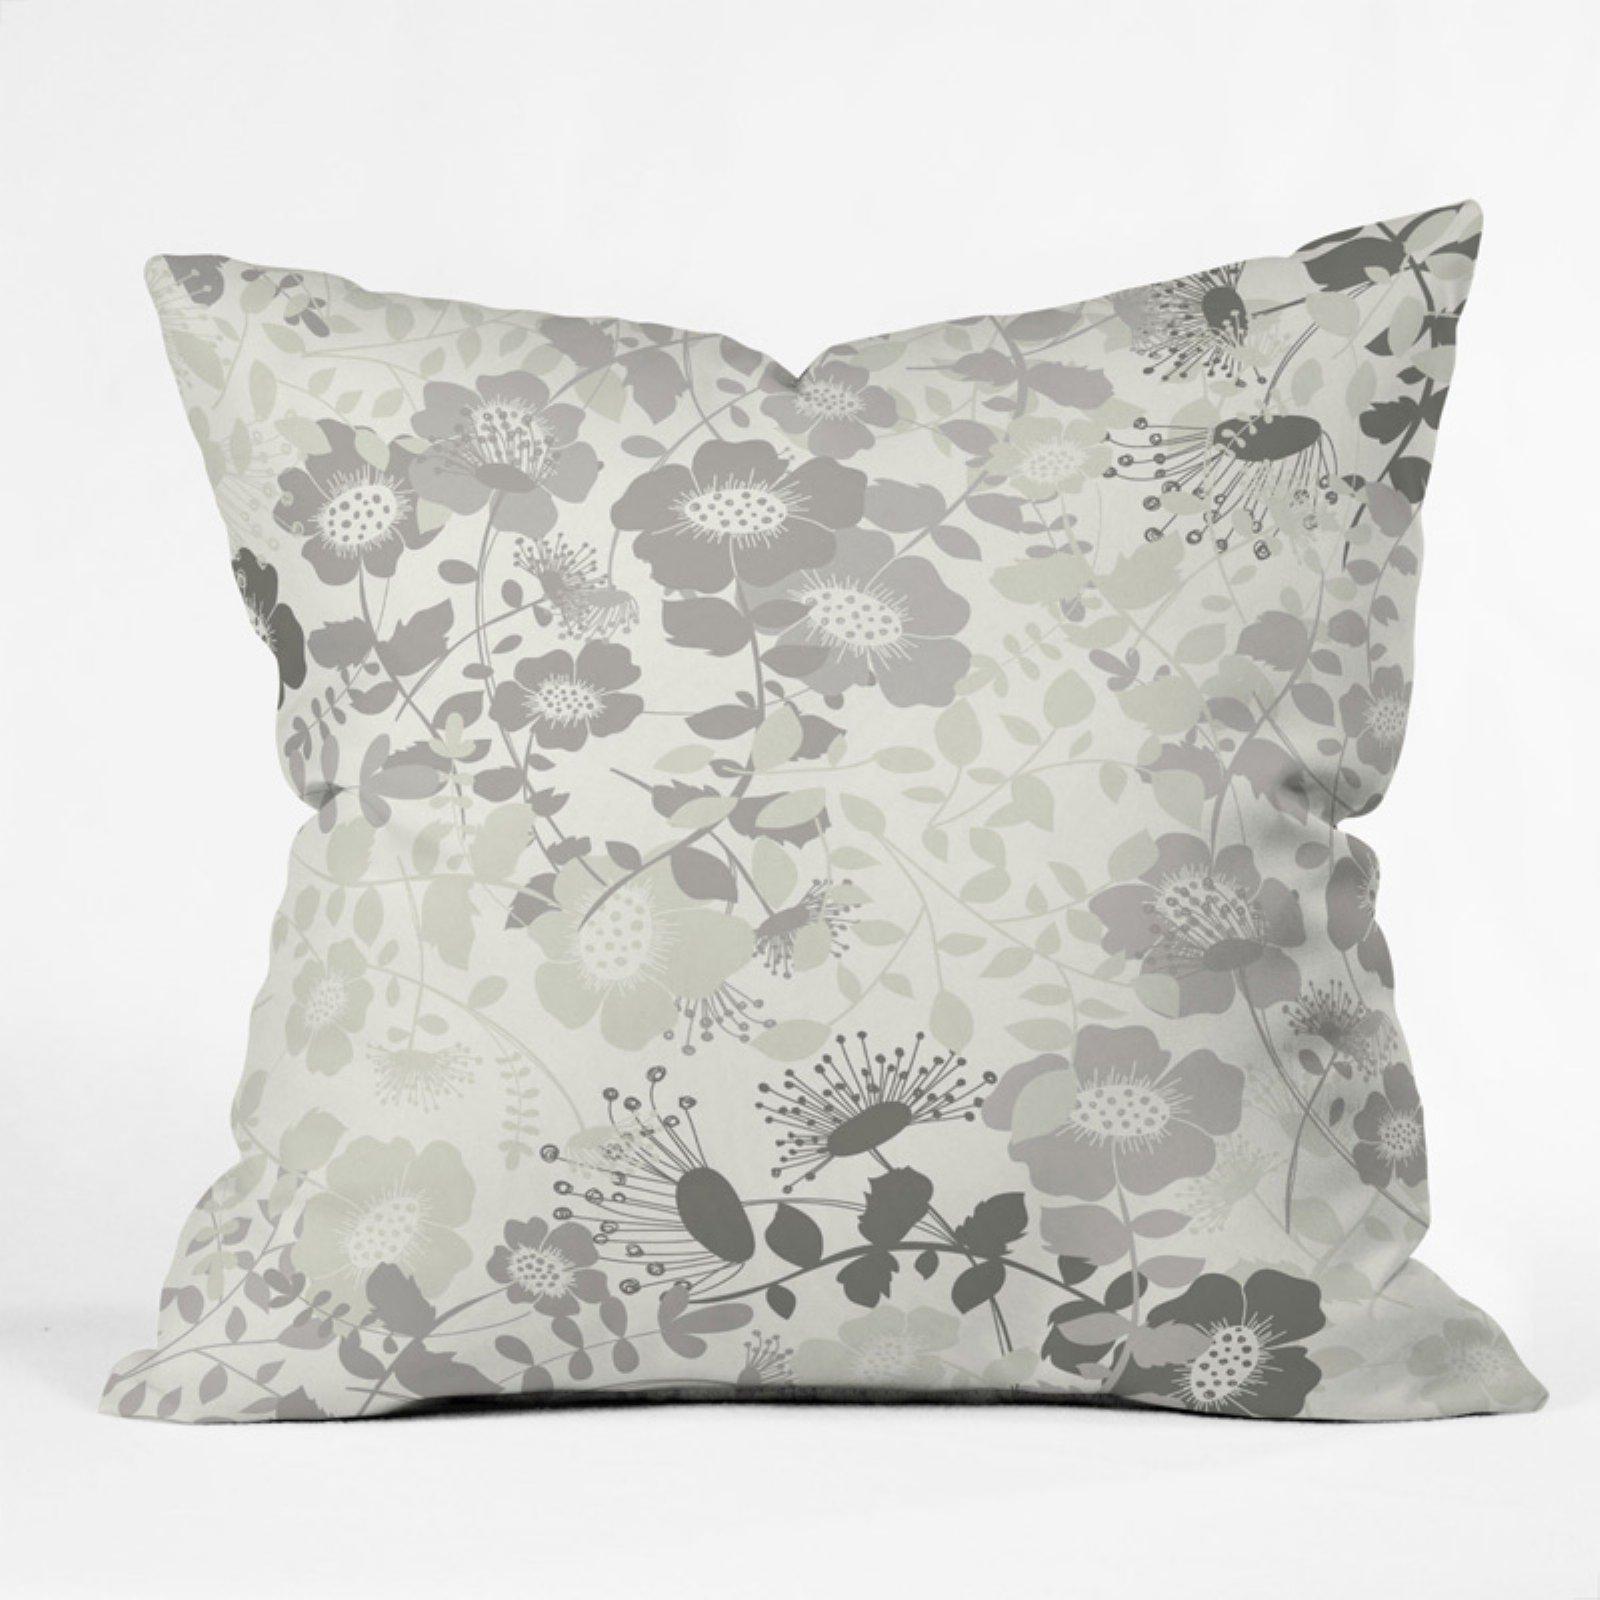 Khristian A Howell Provencal Throw Pillow